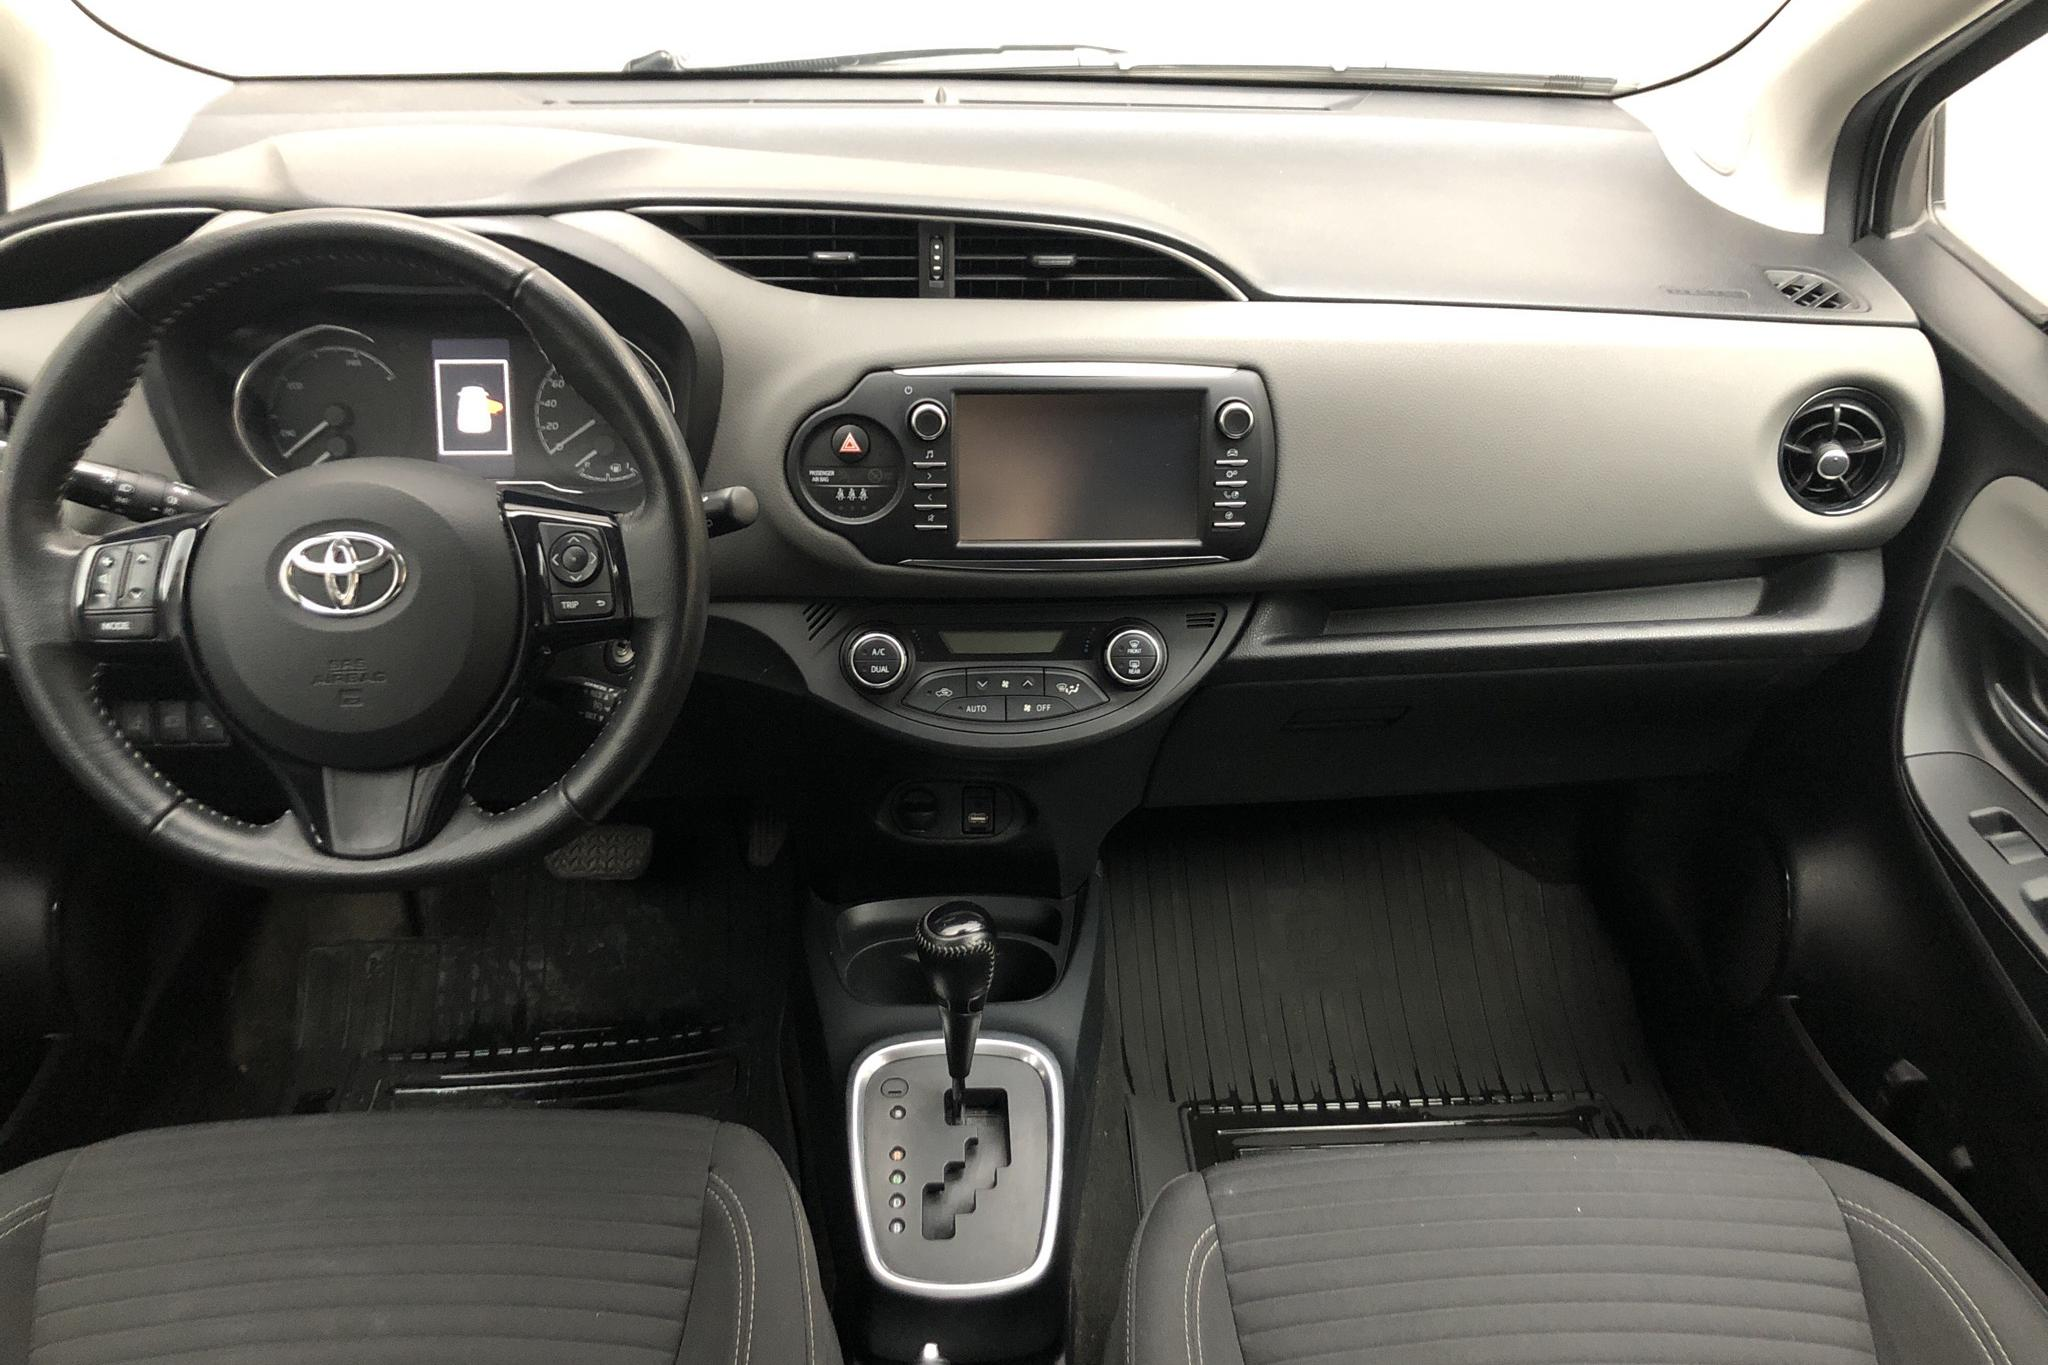 Toyota Yaris 1.5 Hybrid 5dr (101hk) - 59 300 km - Automatic - silver - 2018